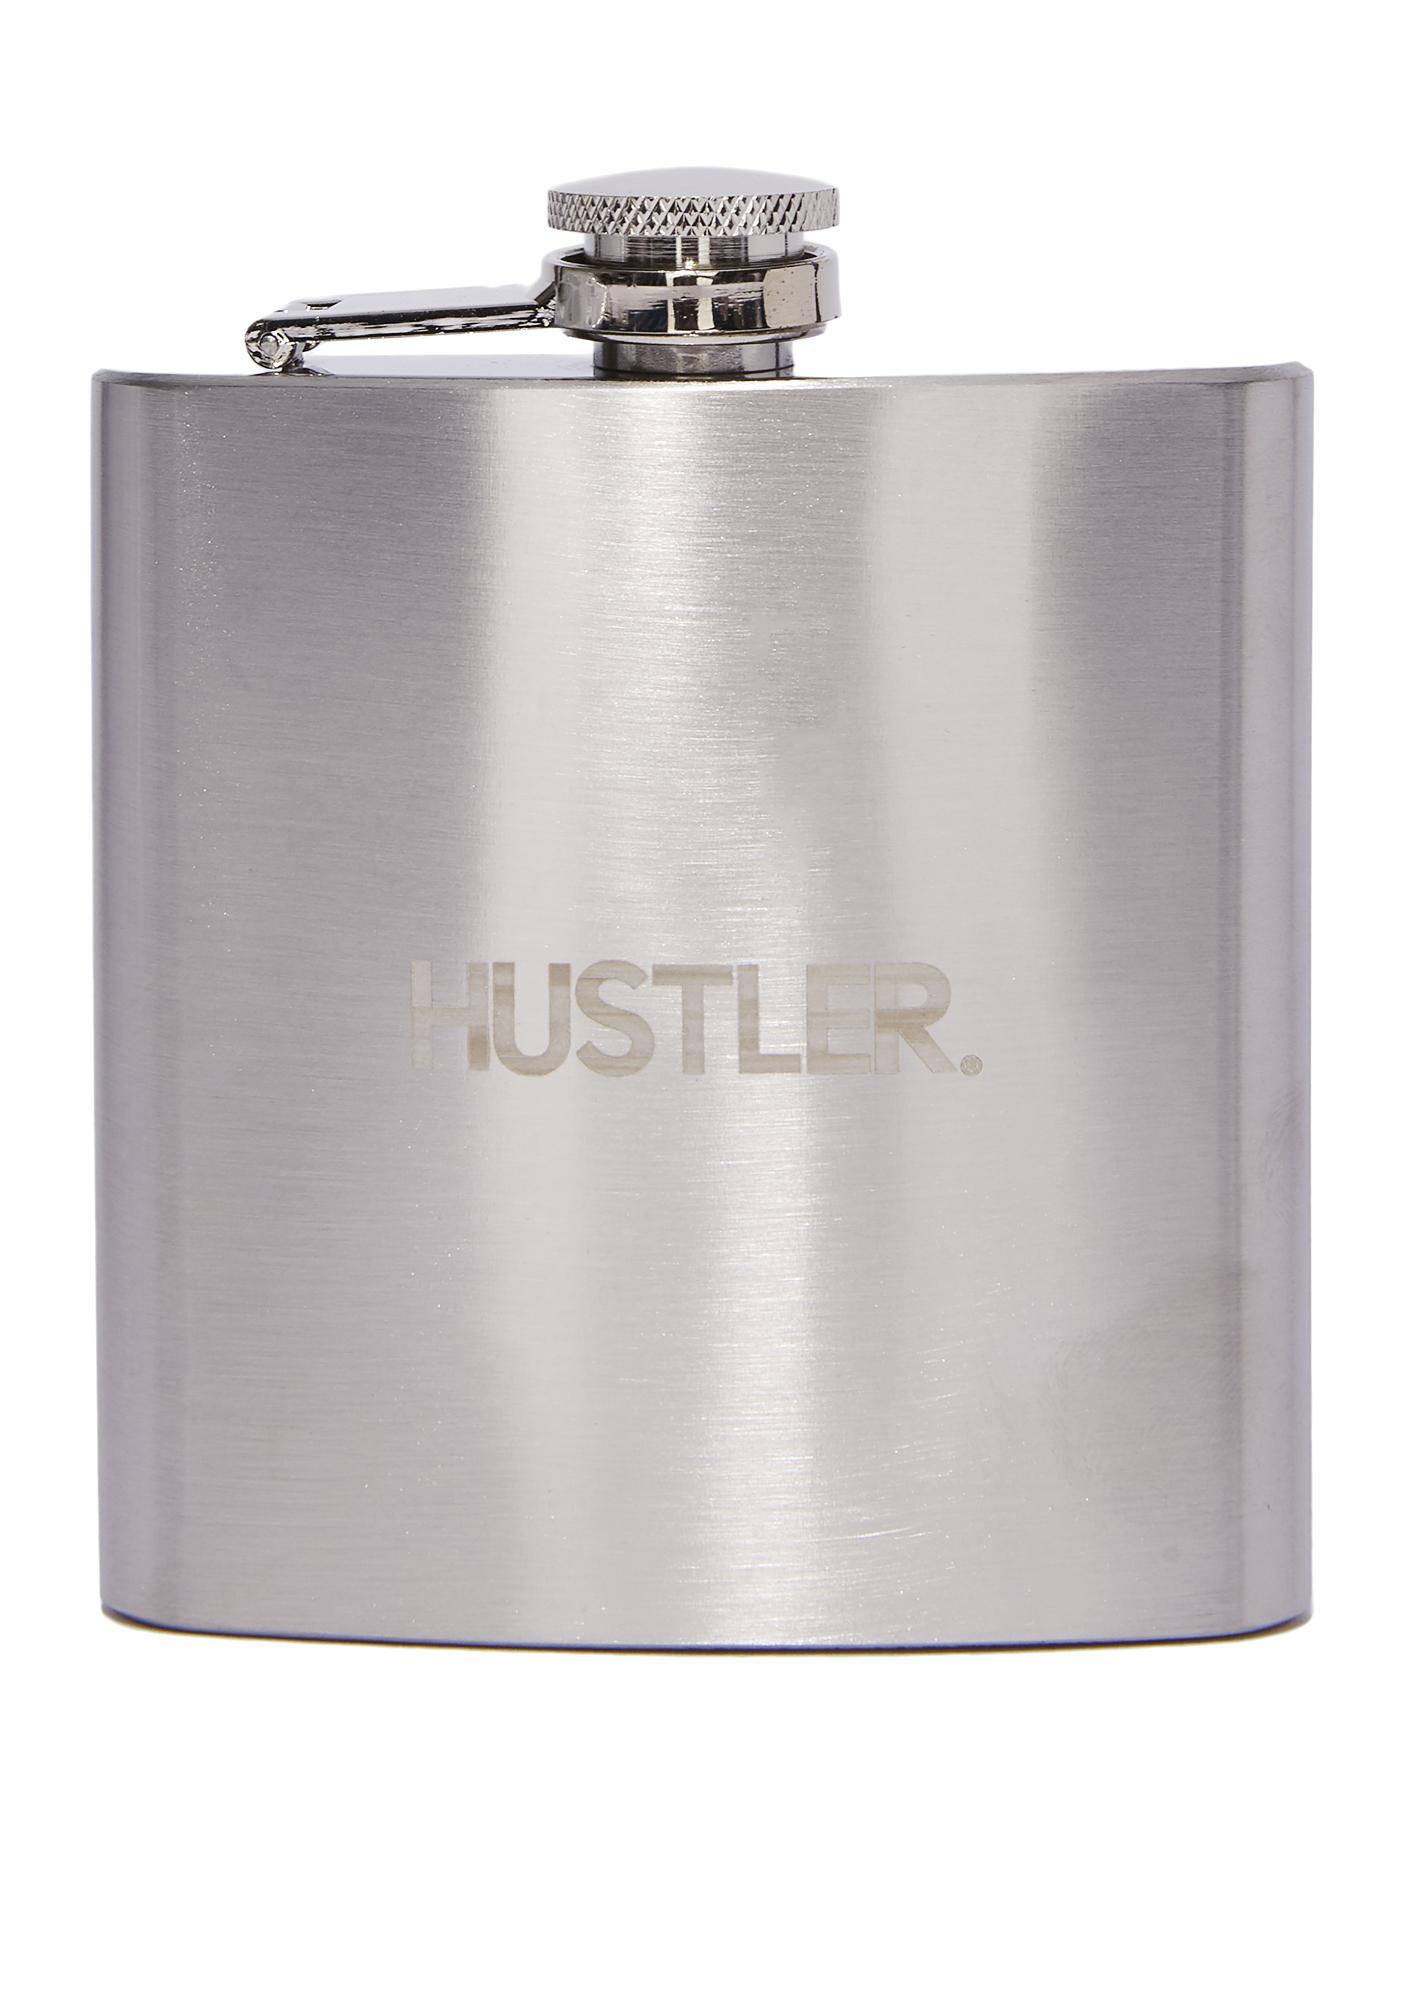 Hustler Square Hustler Logo Hip Flask